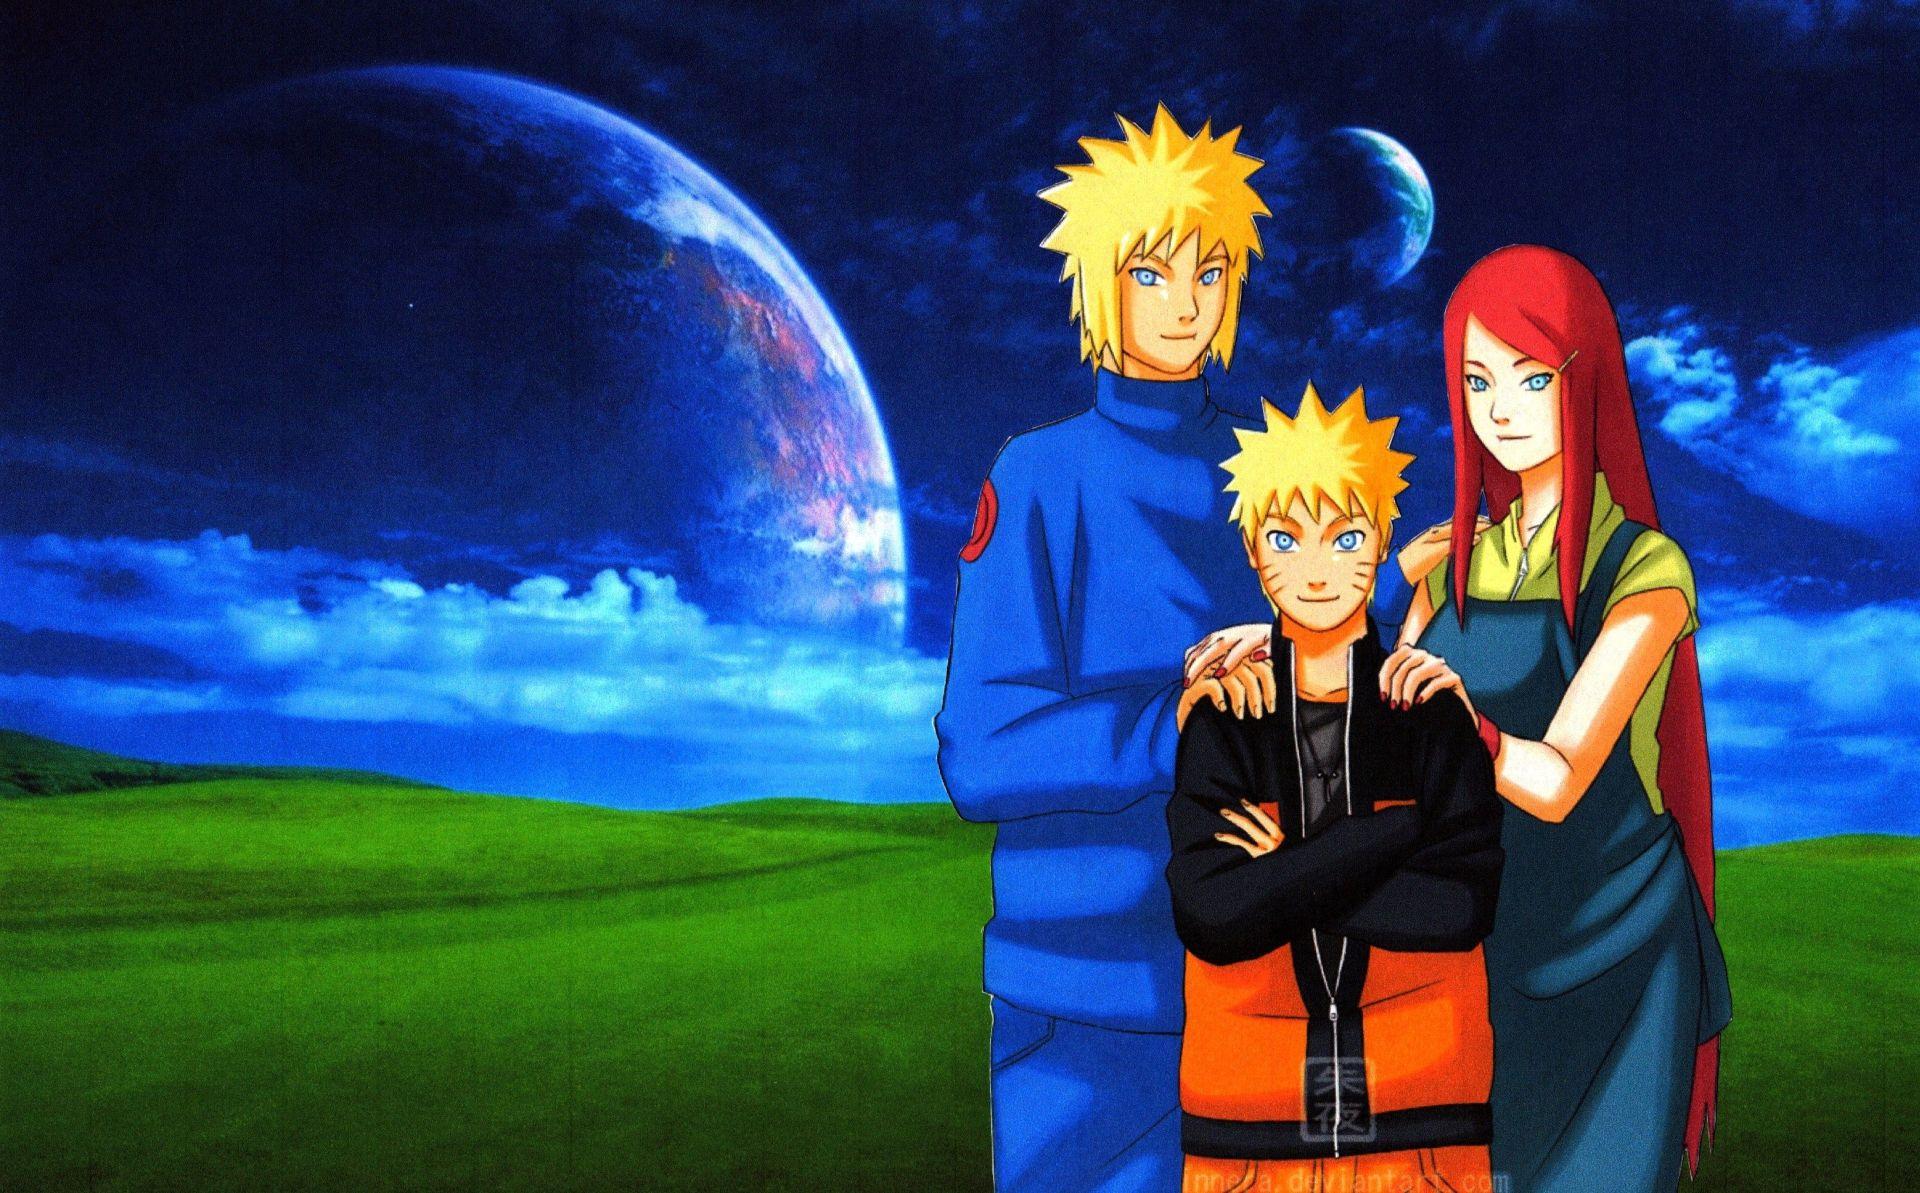 Naruto Art hd, Background Wallpaper HD